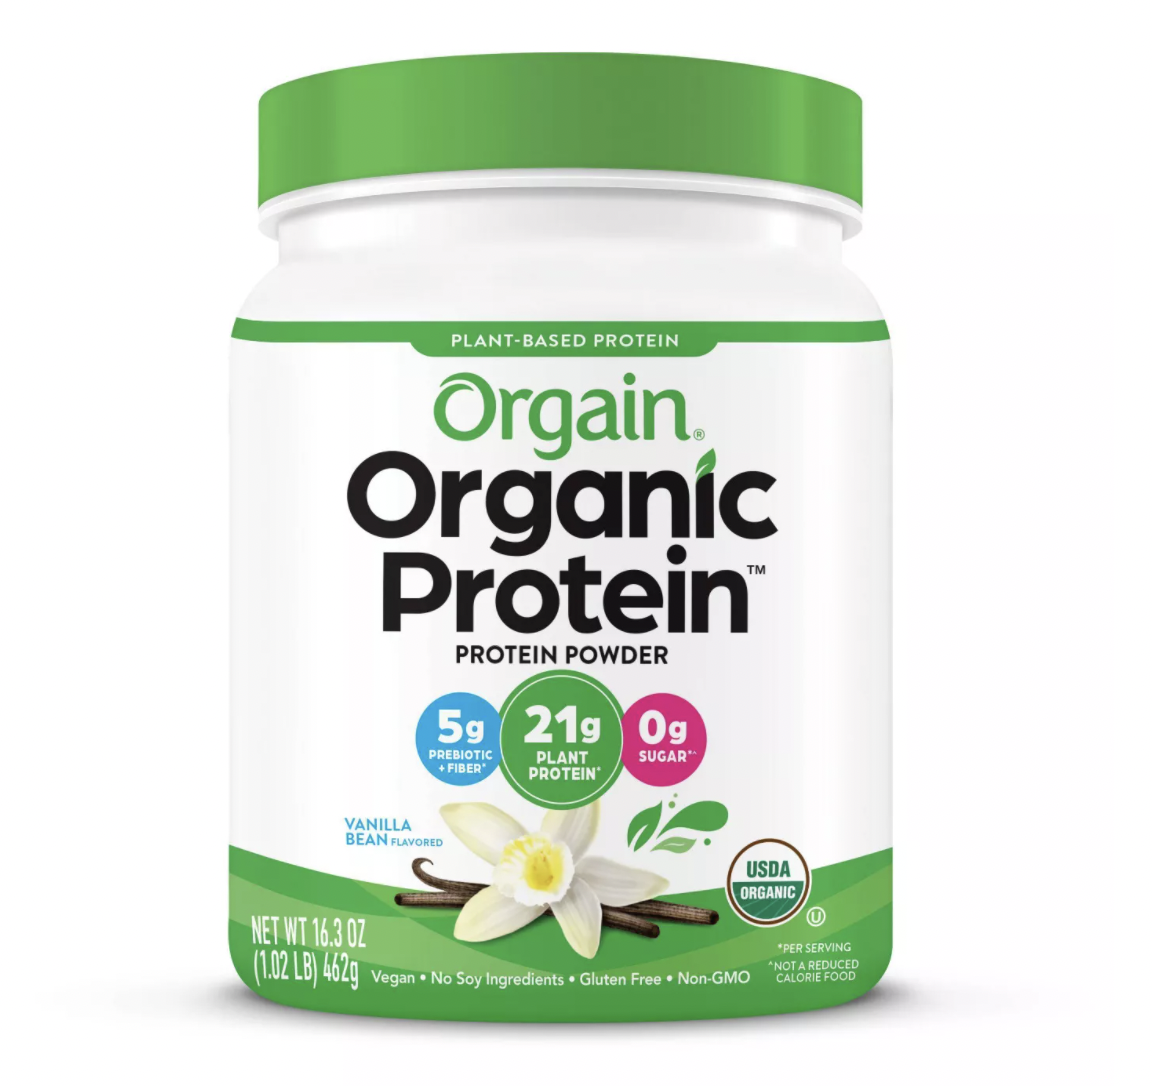 Orgain Organic Vegan Plant-Based Protein Powder - Vanilla Bean - 16.32oz $22